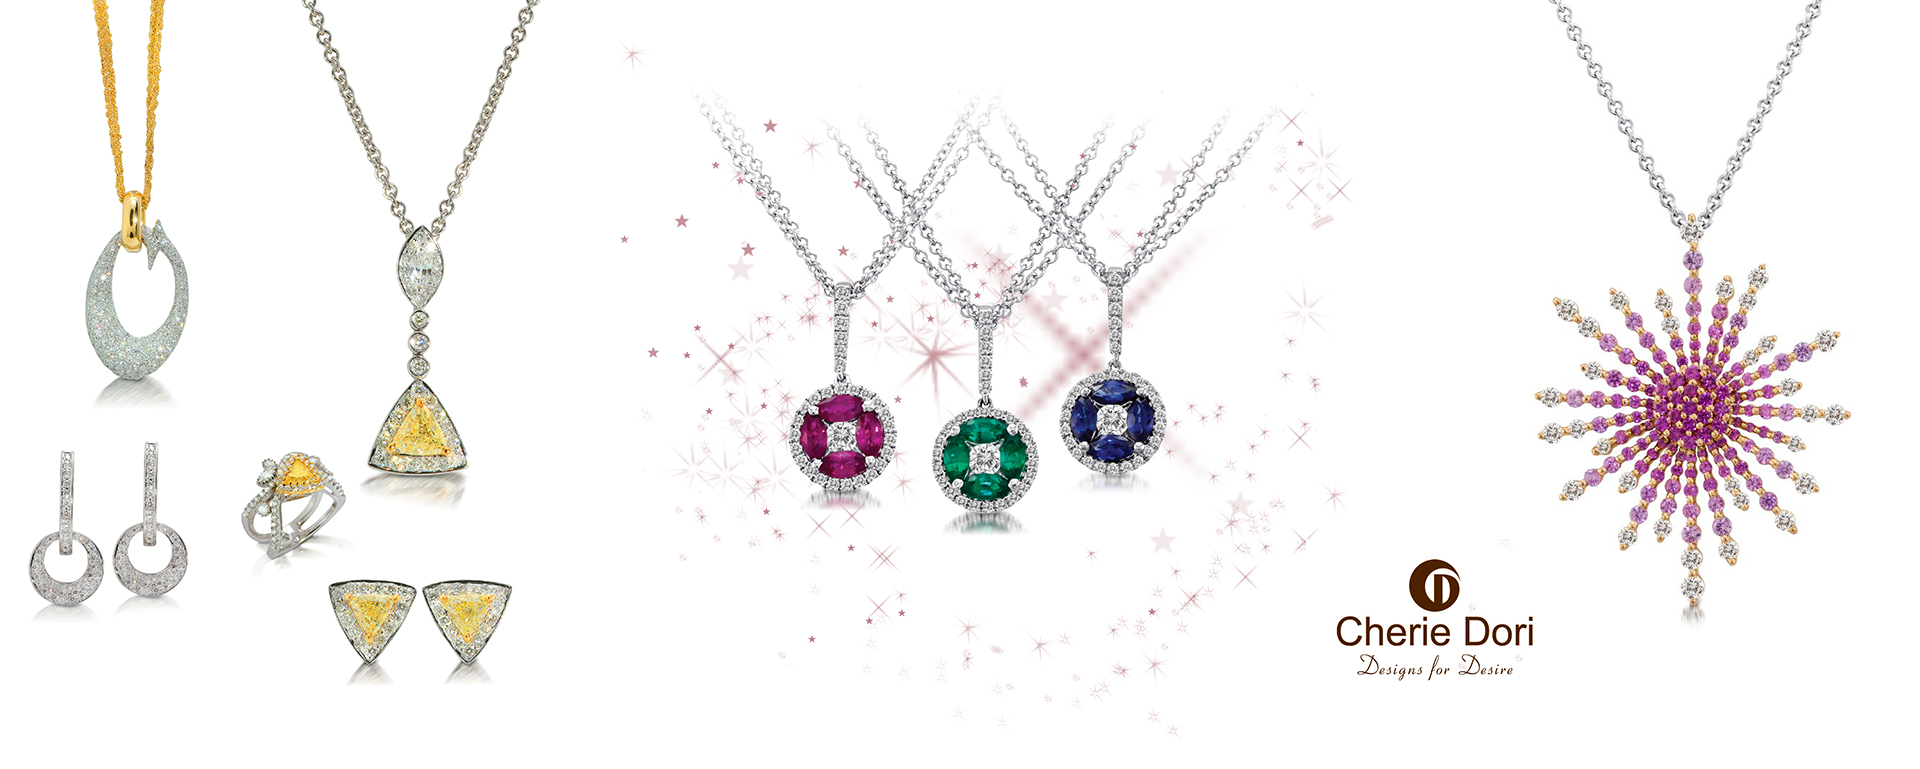 header-cherie-dori-designer-jewelry